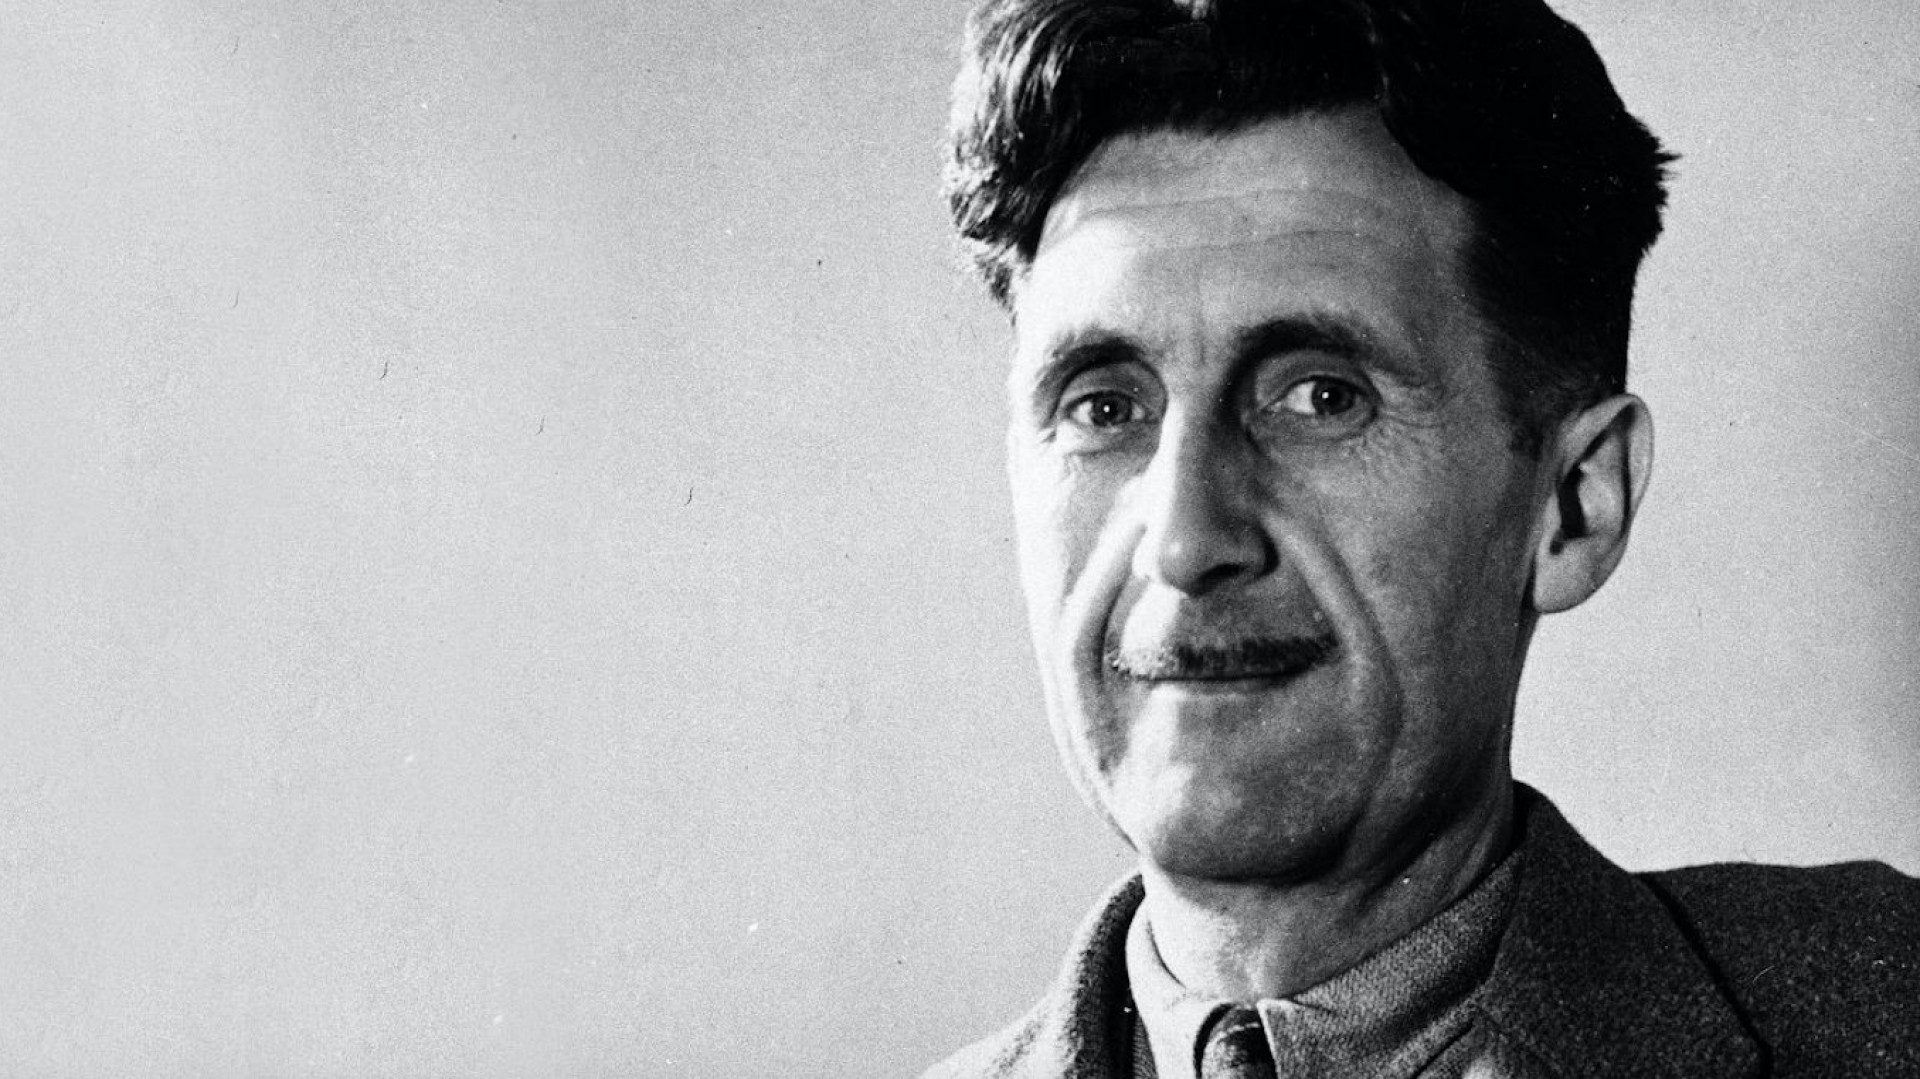 021 George Orwellfit13552c762ssl1 Essay Example Orwell Frightening Essays Everyman's Library Summary Bookshop Memories 1920